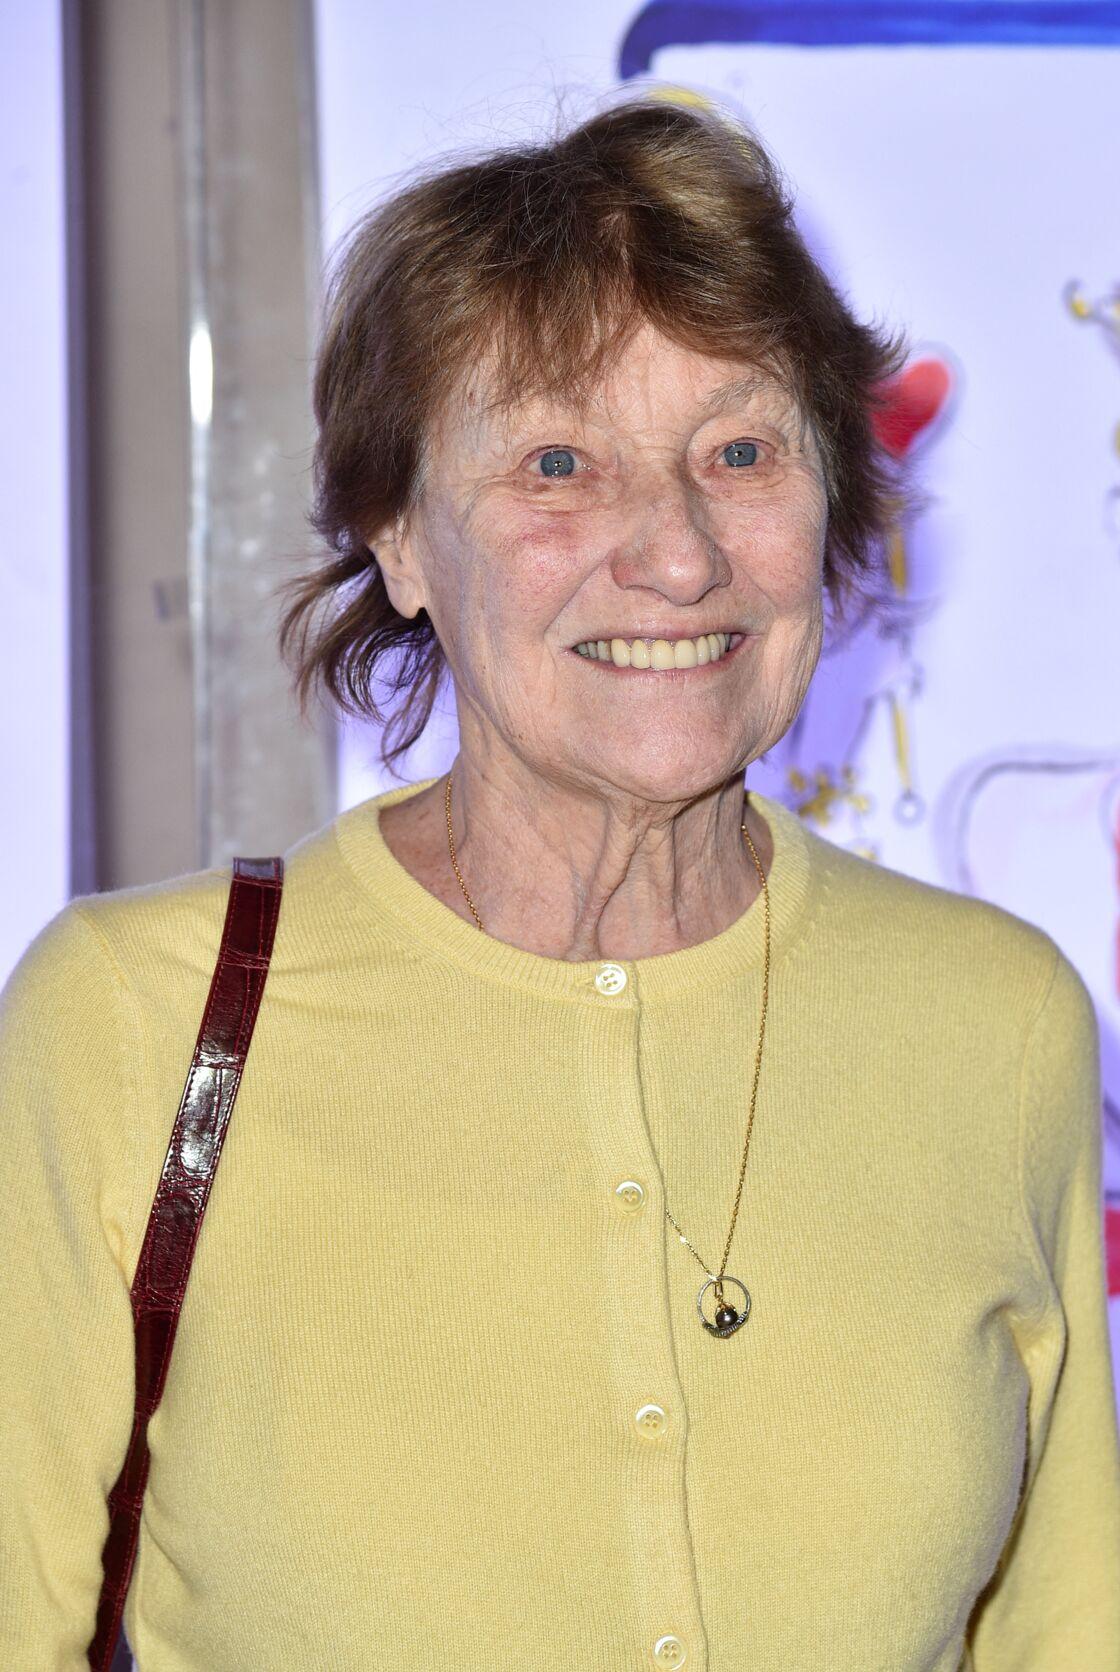 Marisa Bruni Tedeschi au Gala du coeur le 27 janvier 2020